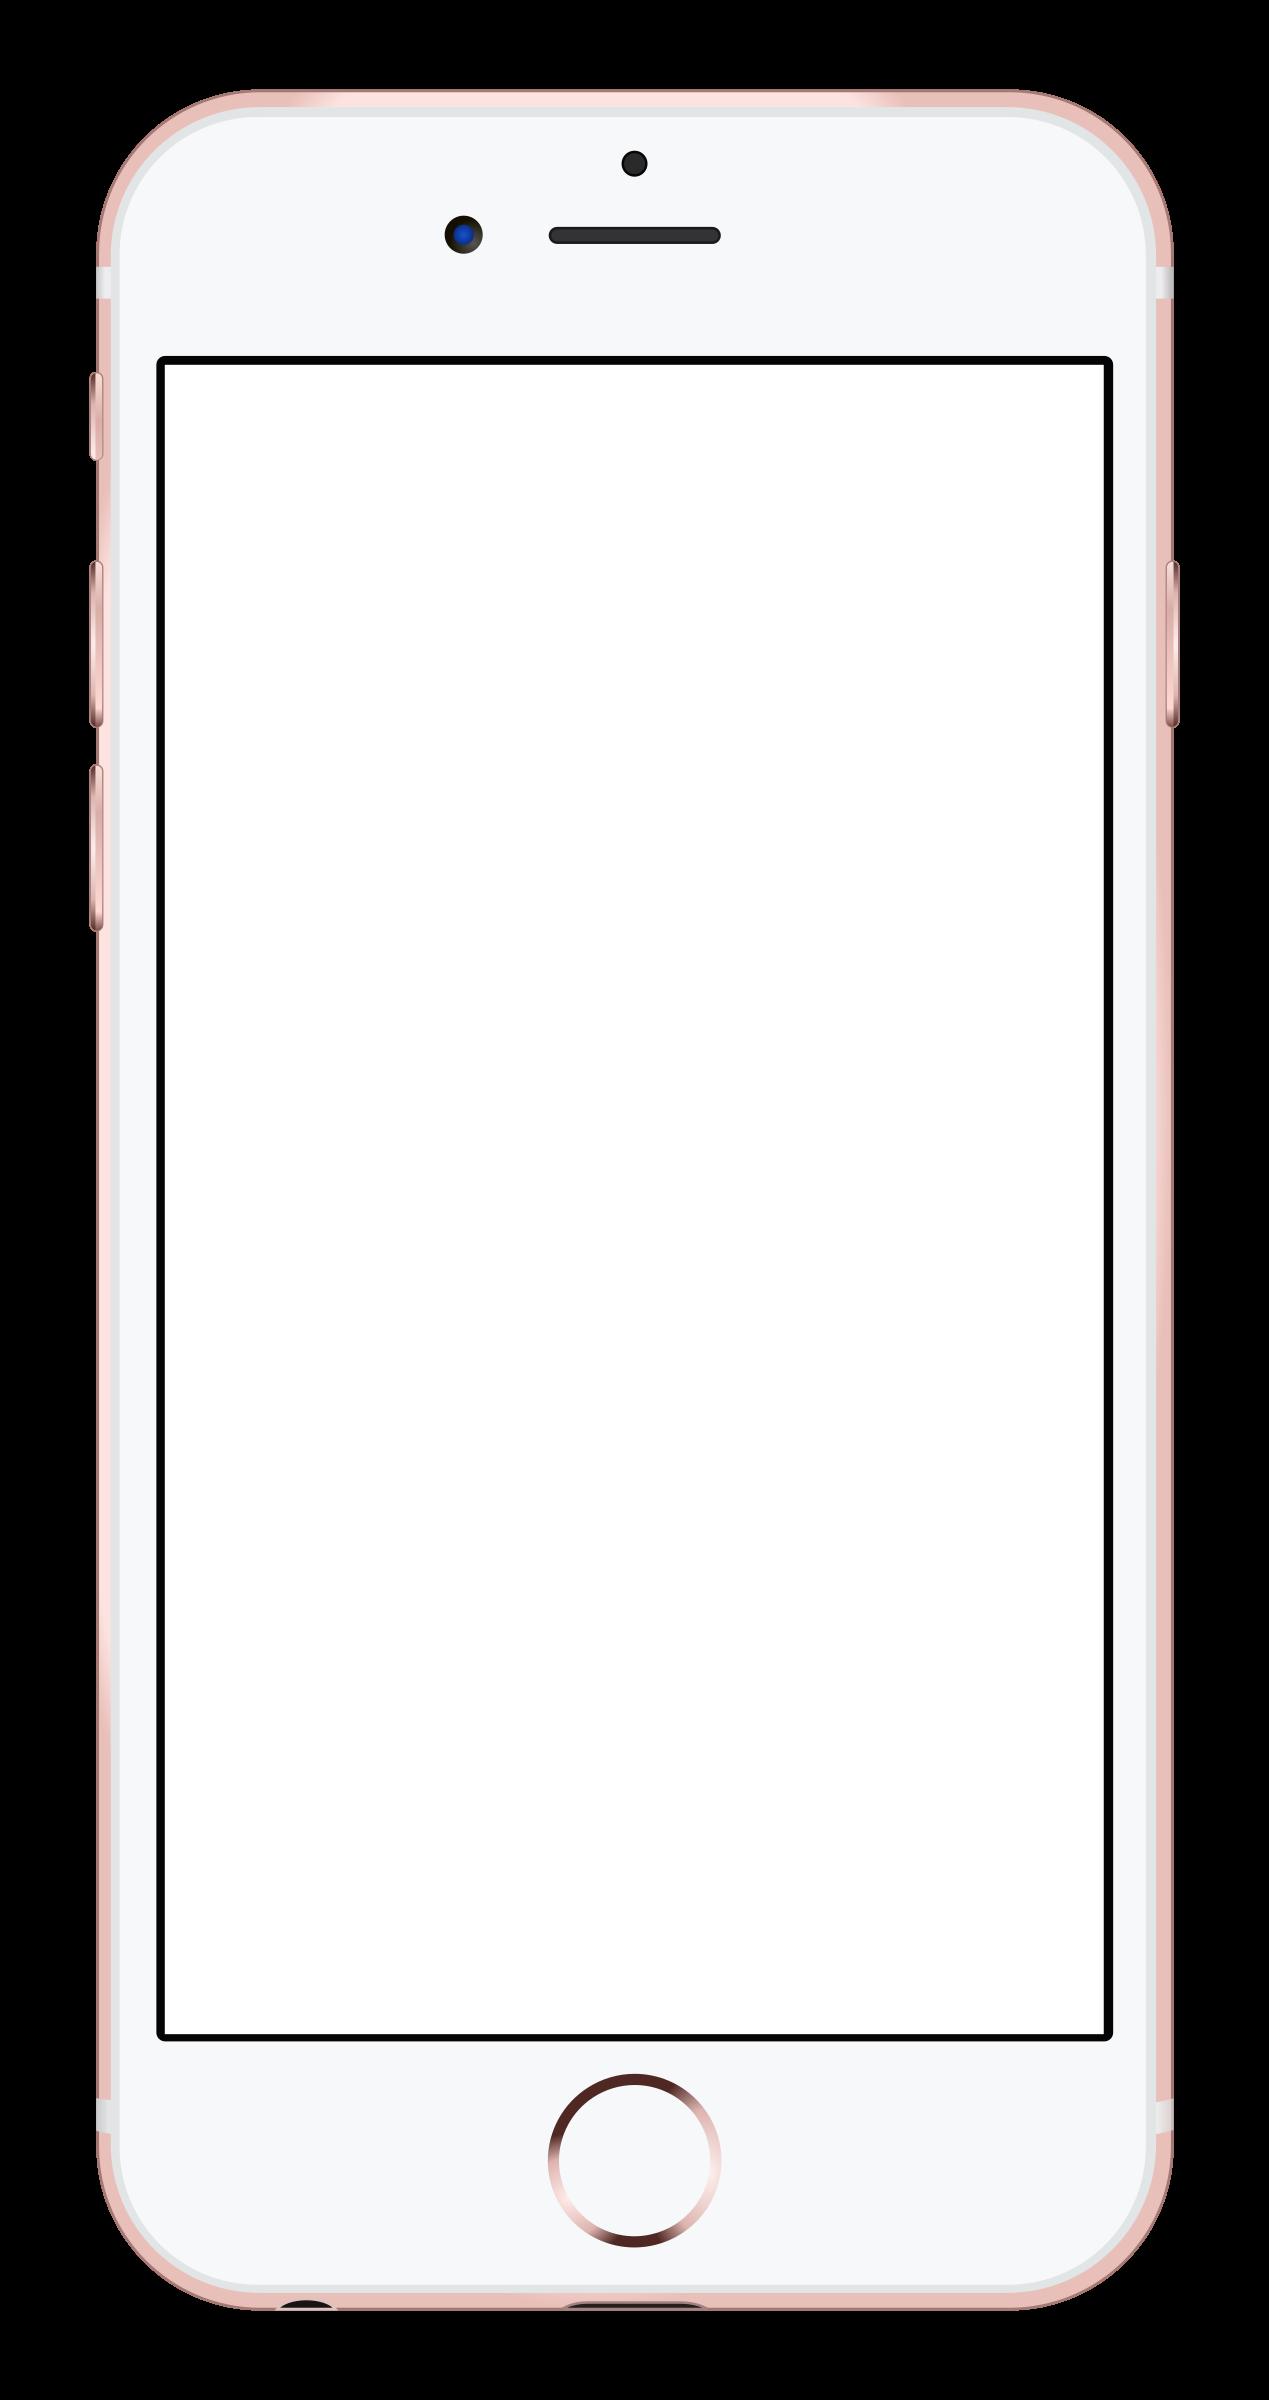 Iphone clipart iphone icon, Iphone iphone icon Transparent ...